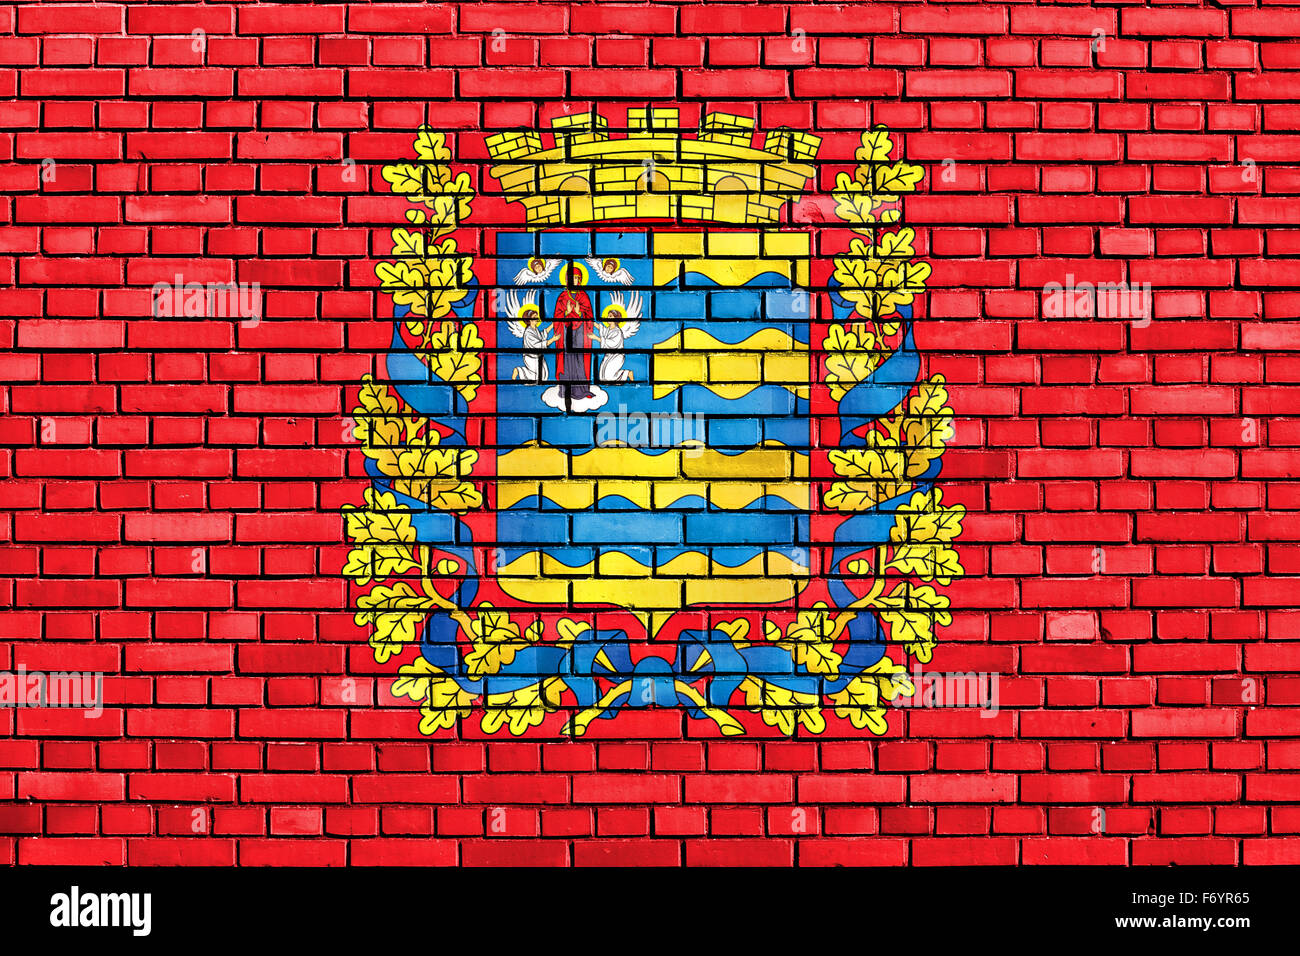 flag of Minsk Region painted on brick wall - Stock Image